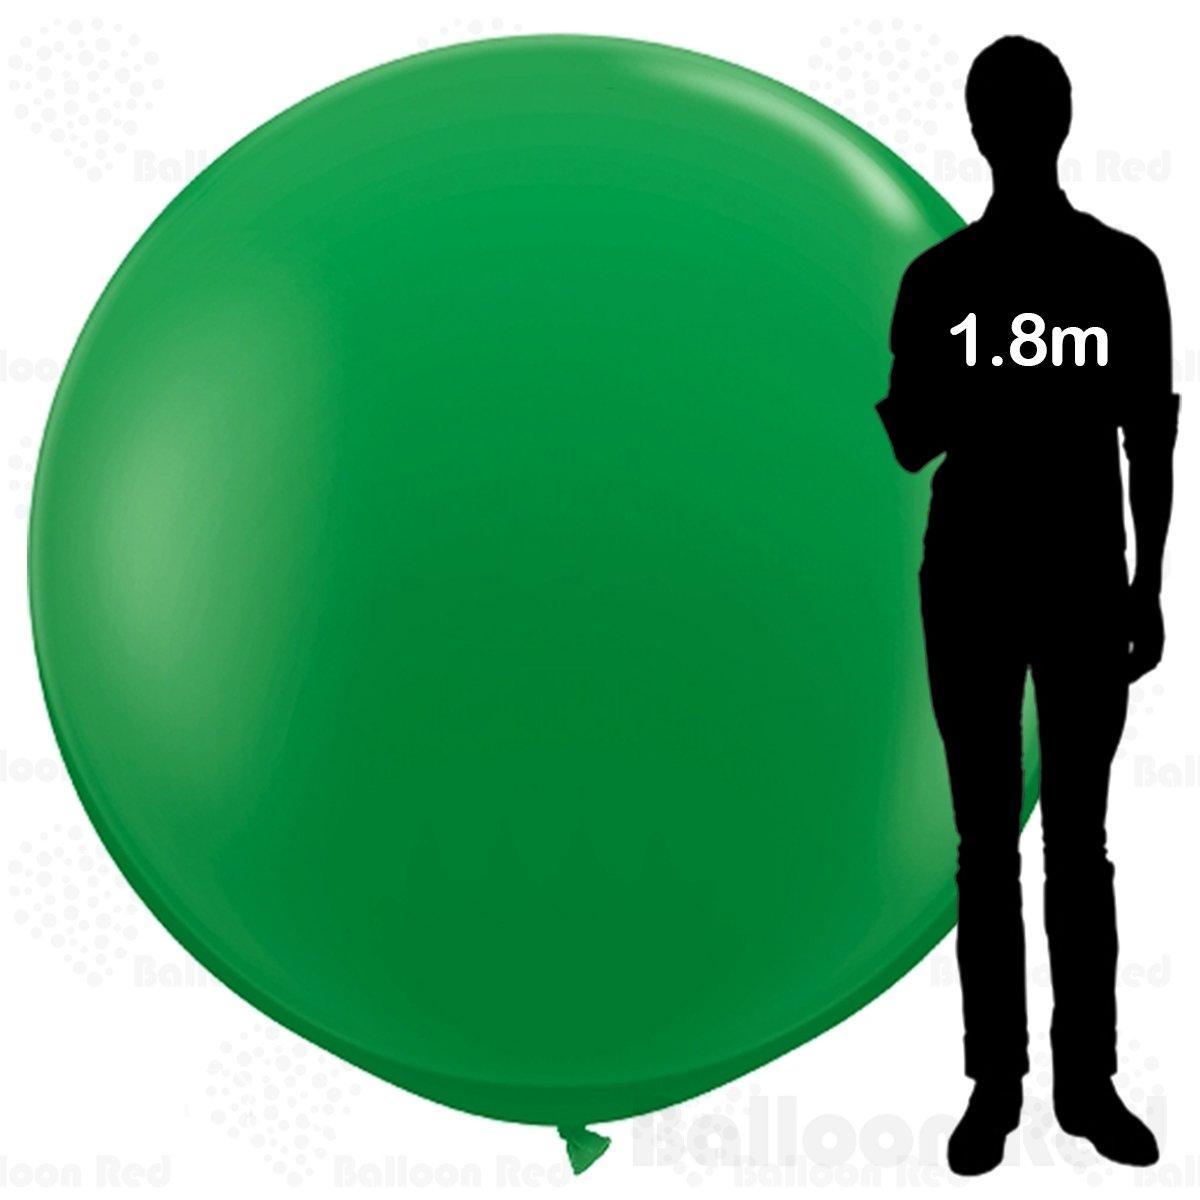 Giant Jumbo Roundラテックスバルーンプレミアム品質 Pack of 1 グリーン 72lat-gn   B01FXO0RP0